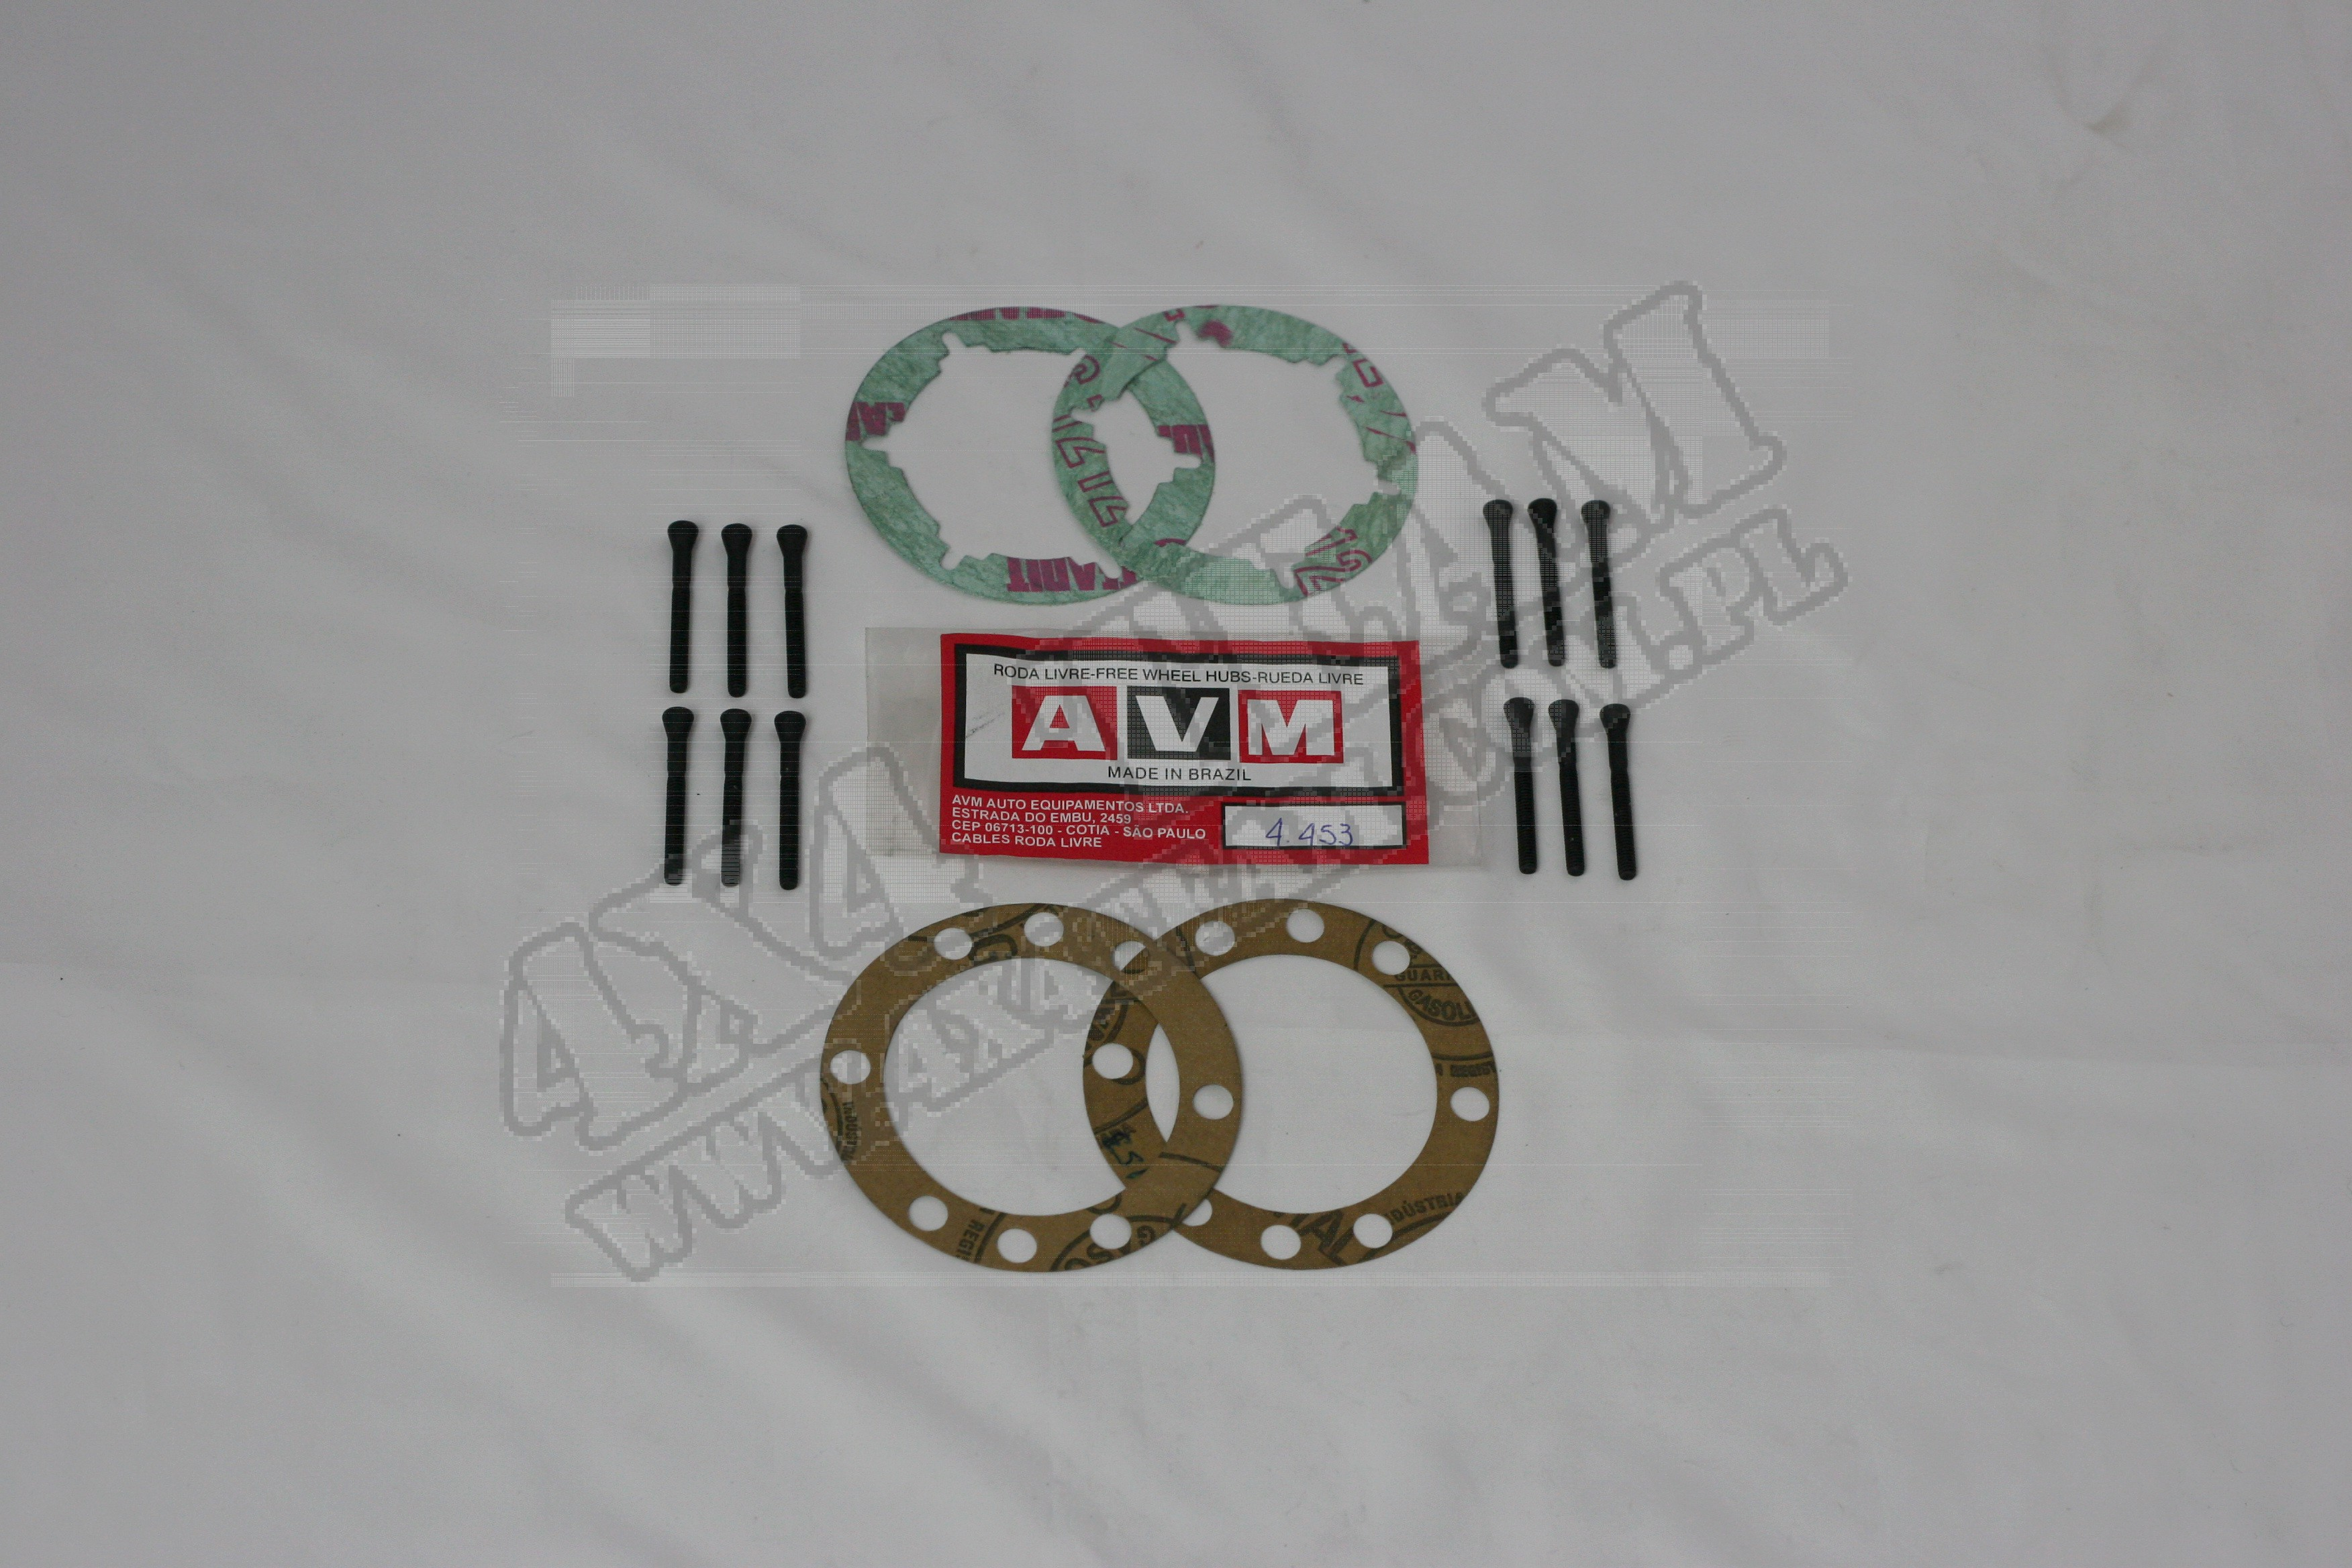 Zestaw serwisowy AVM 4.453